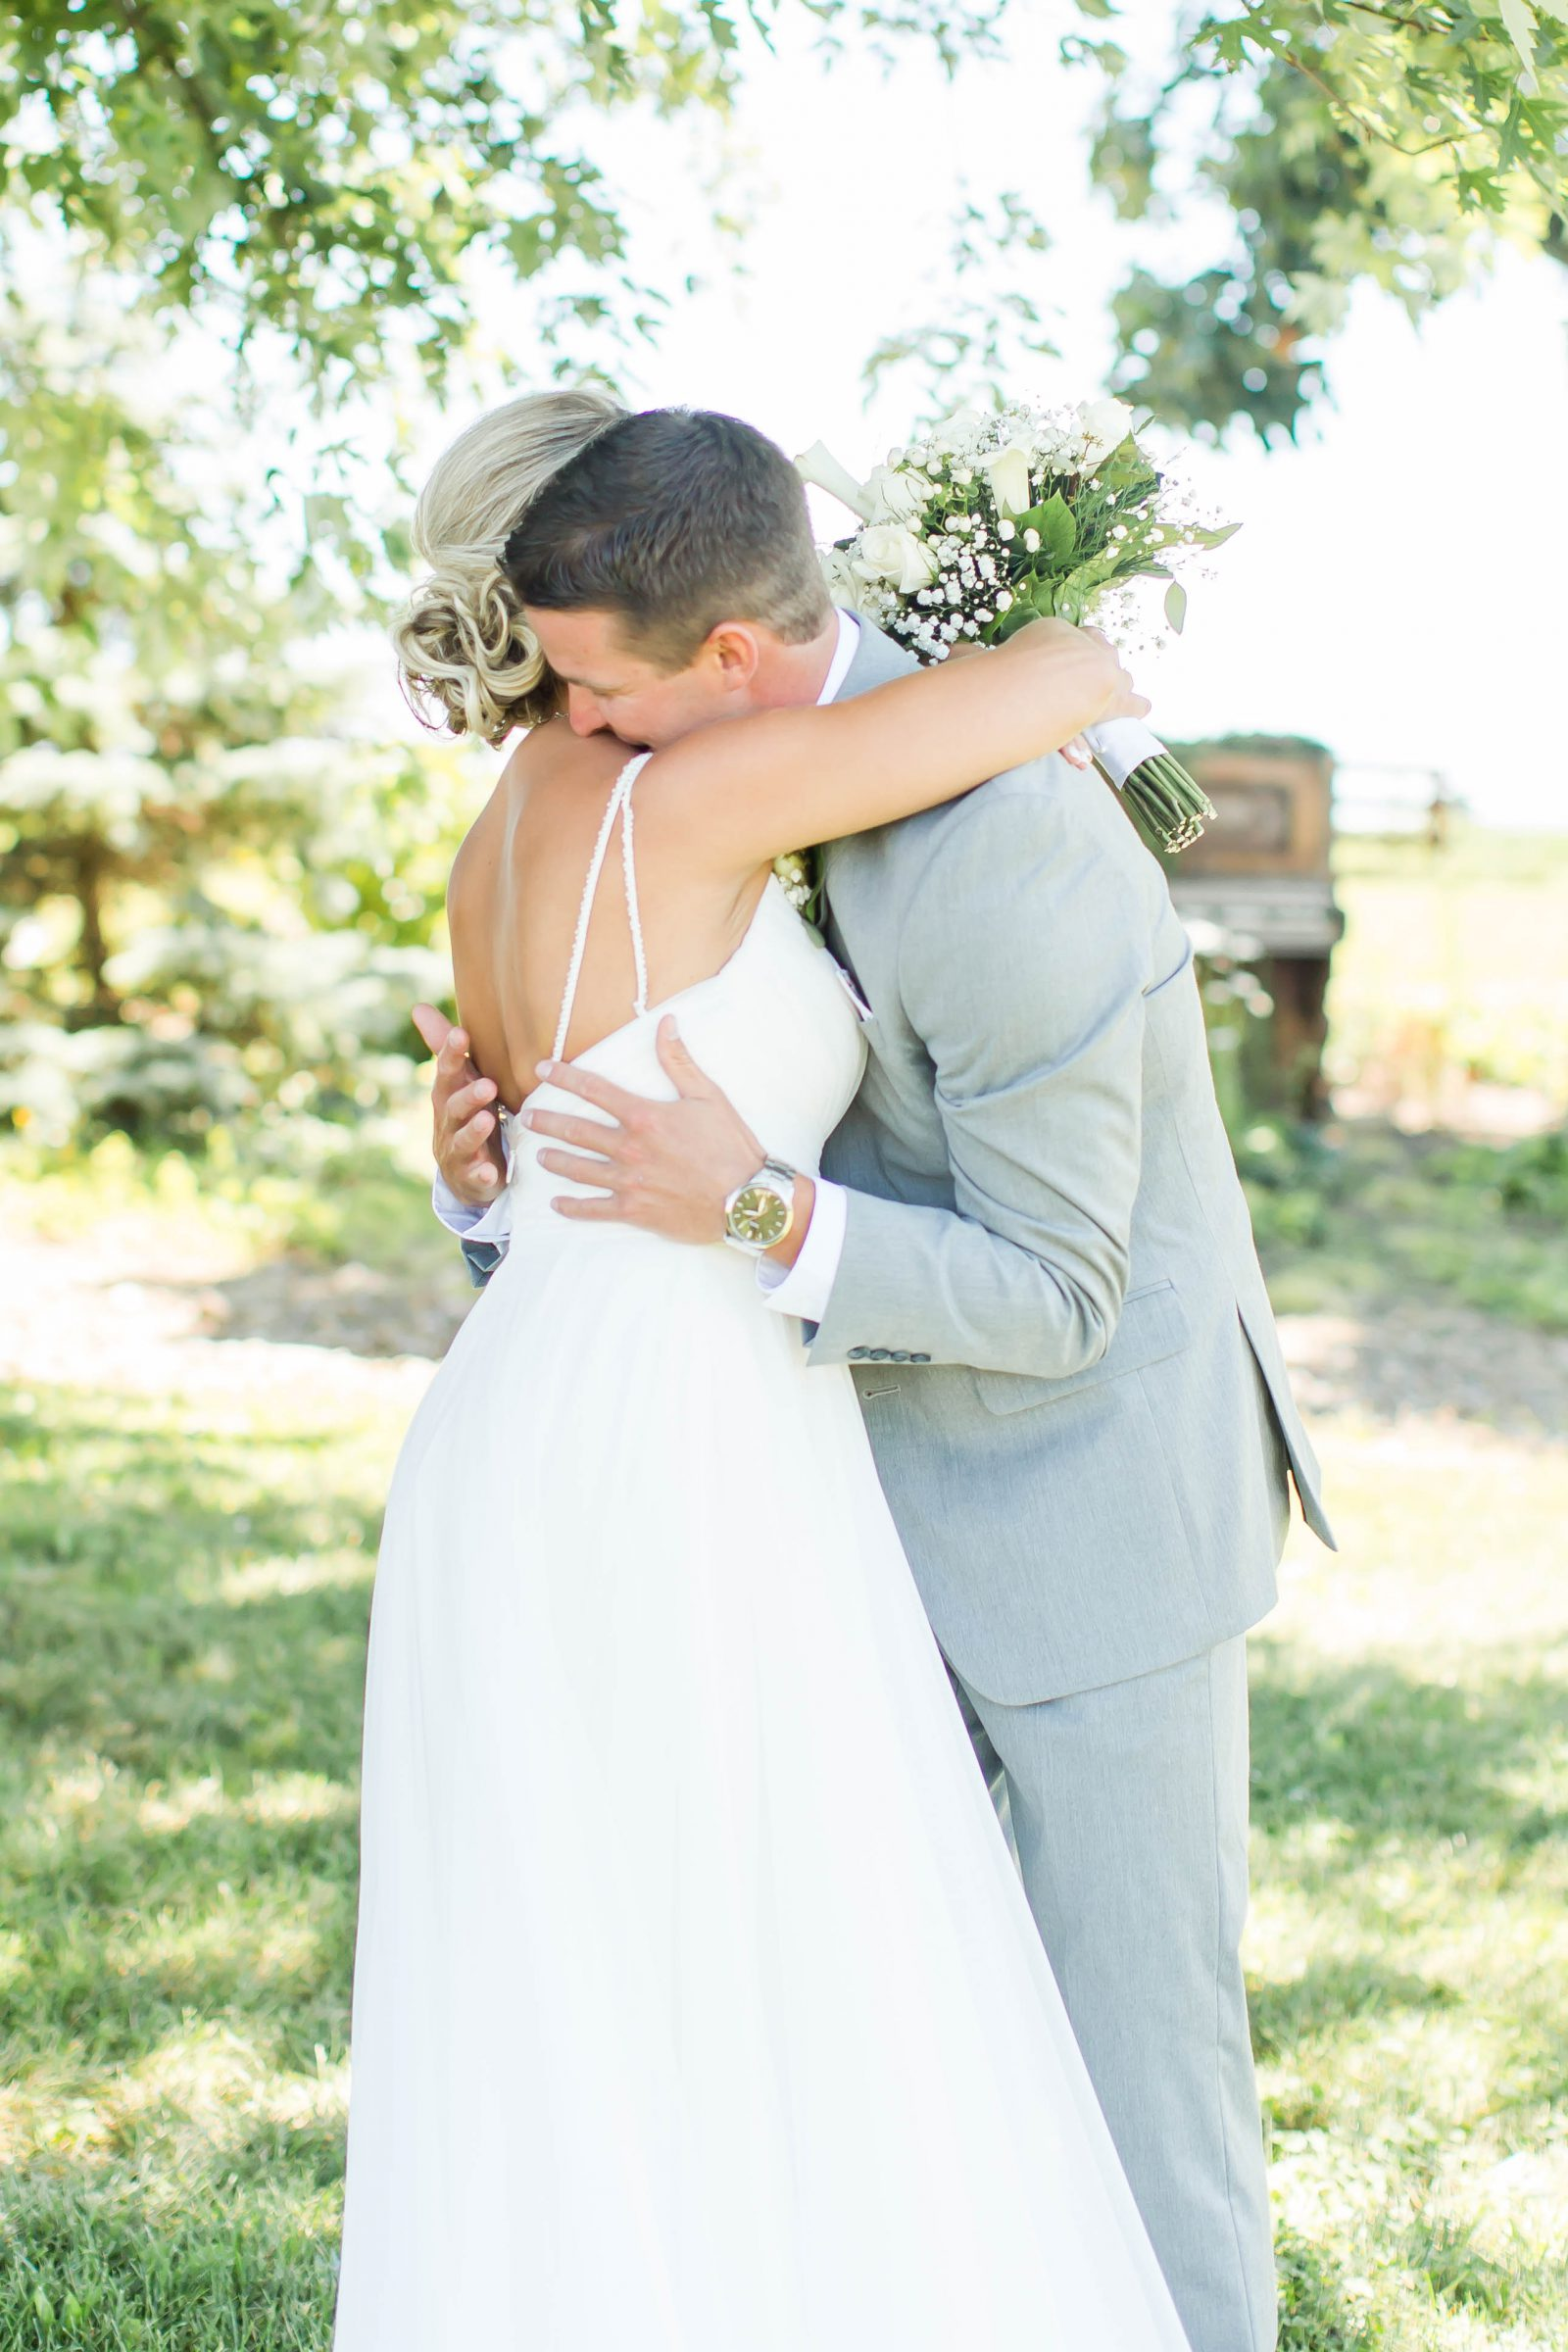 peacock-ridge-summer-wedding-photographer-akron-ohio-loren-jackson-photography-28